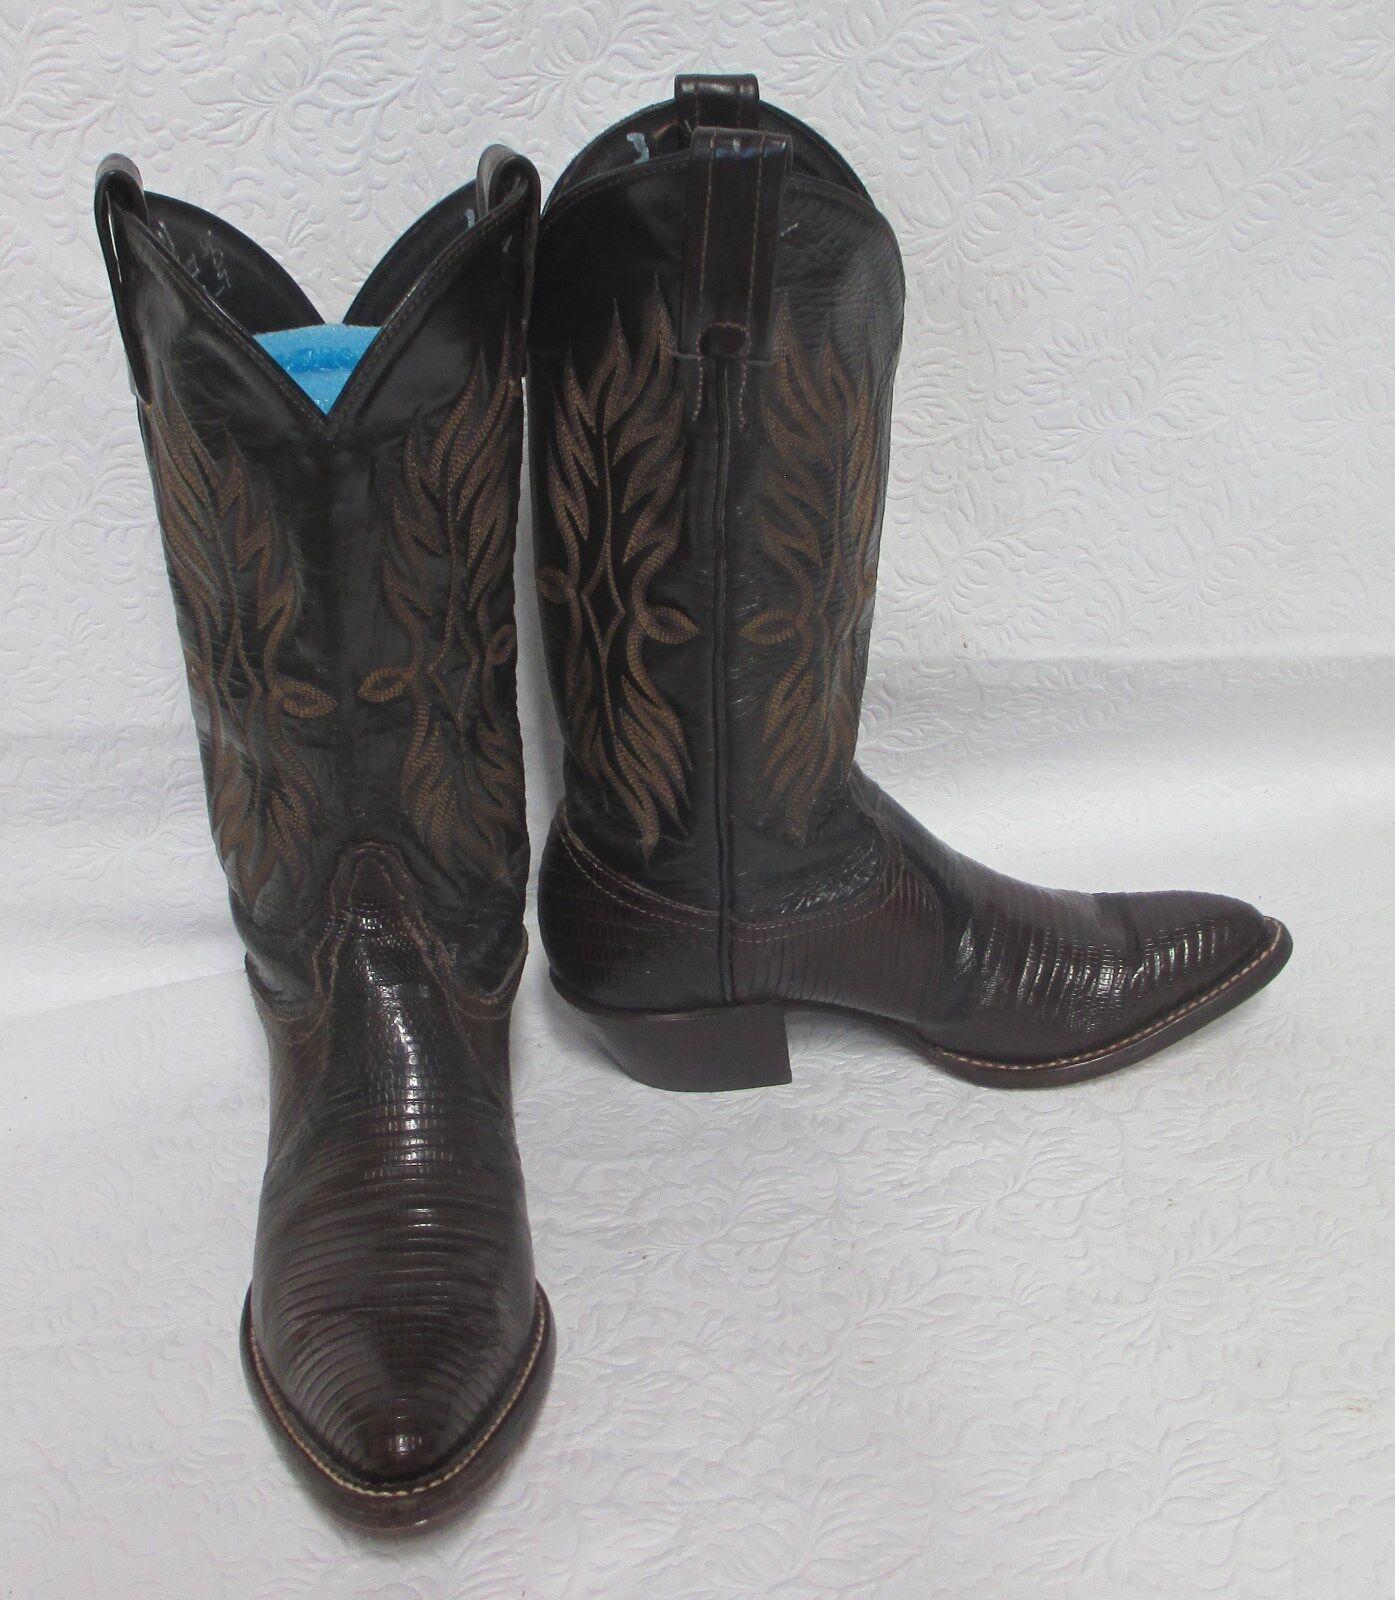 Women's Tony Lama Brown Exotic Lizard Skin & Leather Cowboy Boots 8413 Sz 5 M